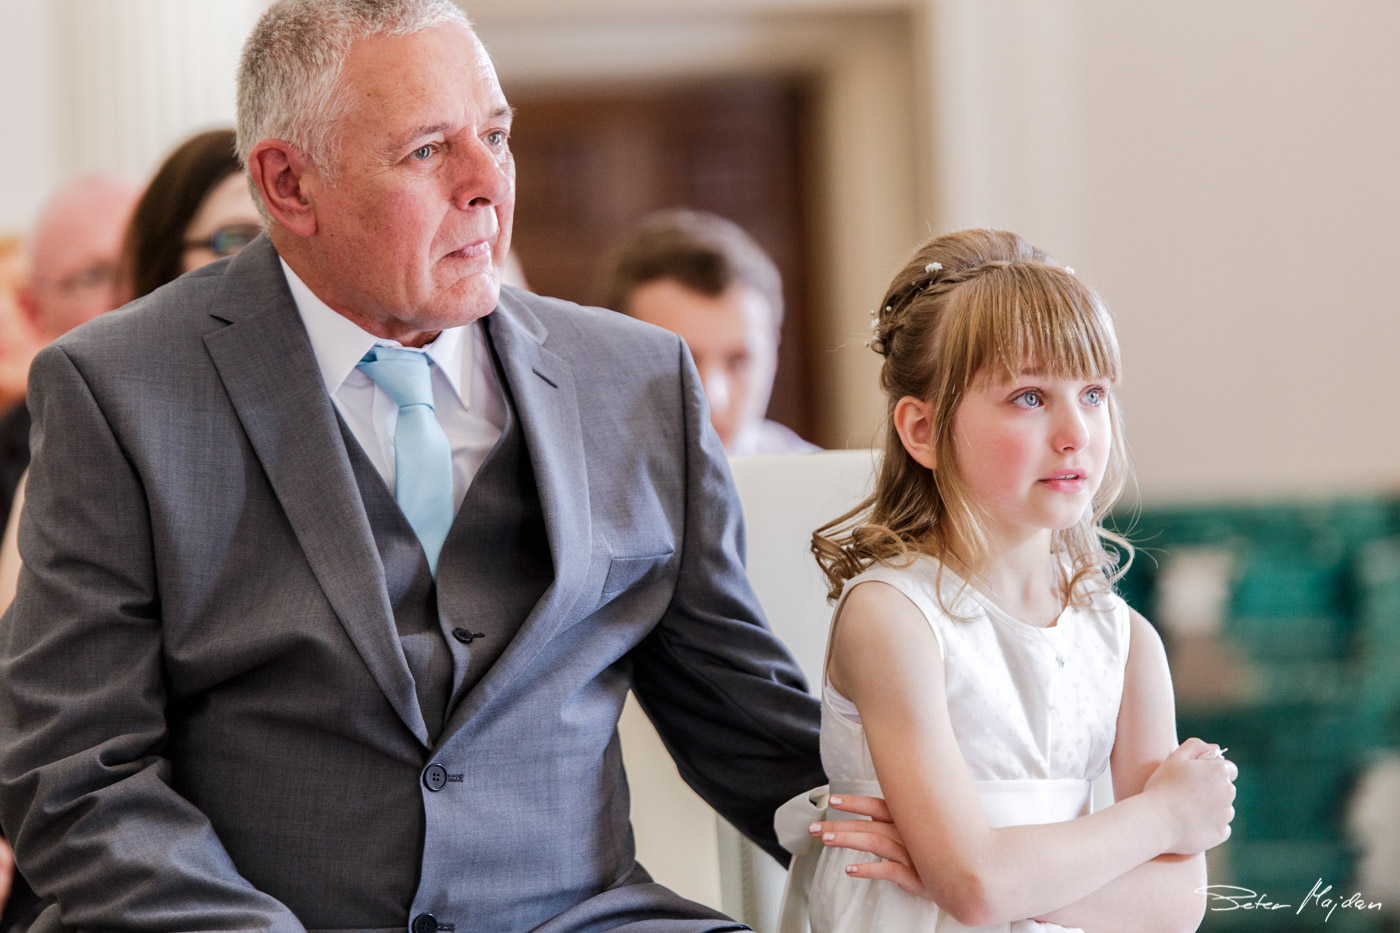 Colwick-hall-wedding-photography-18.jpg